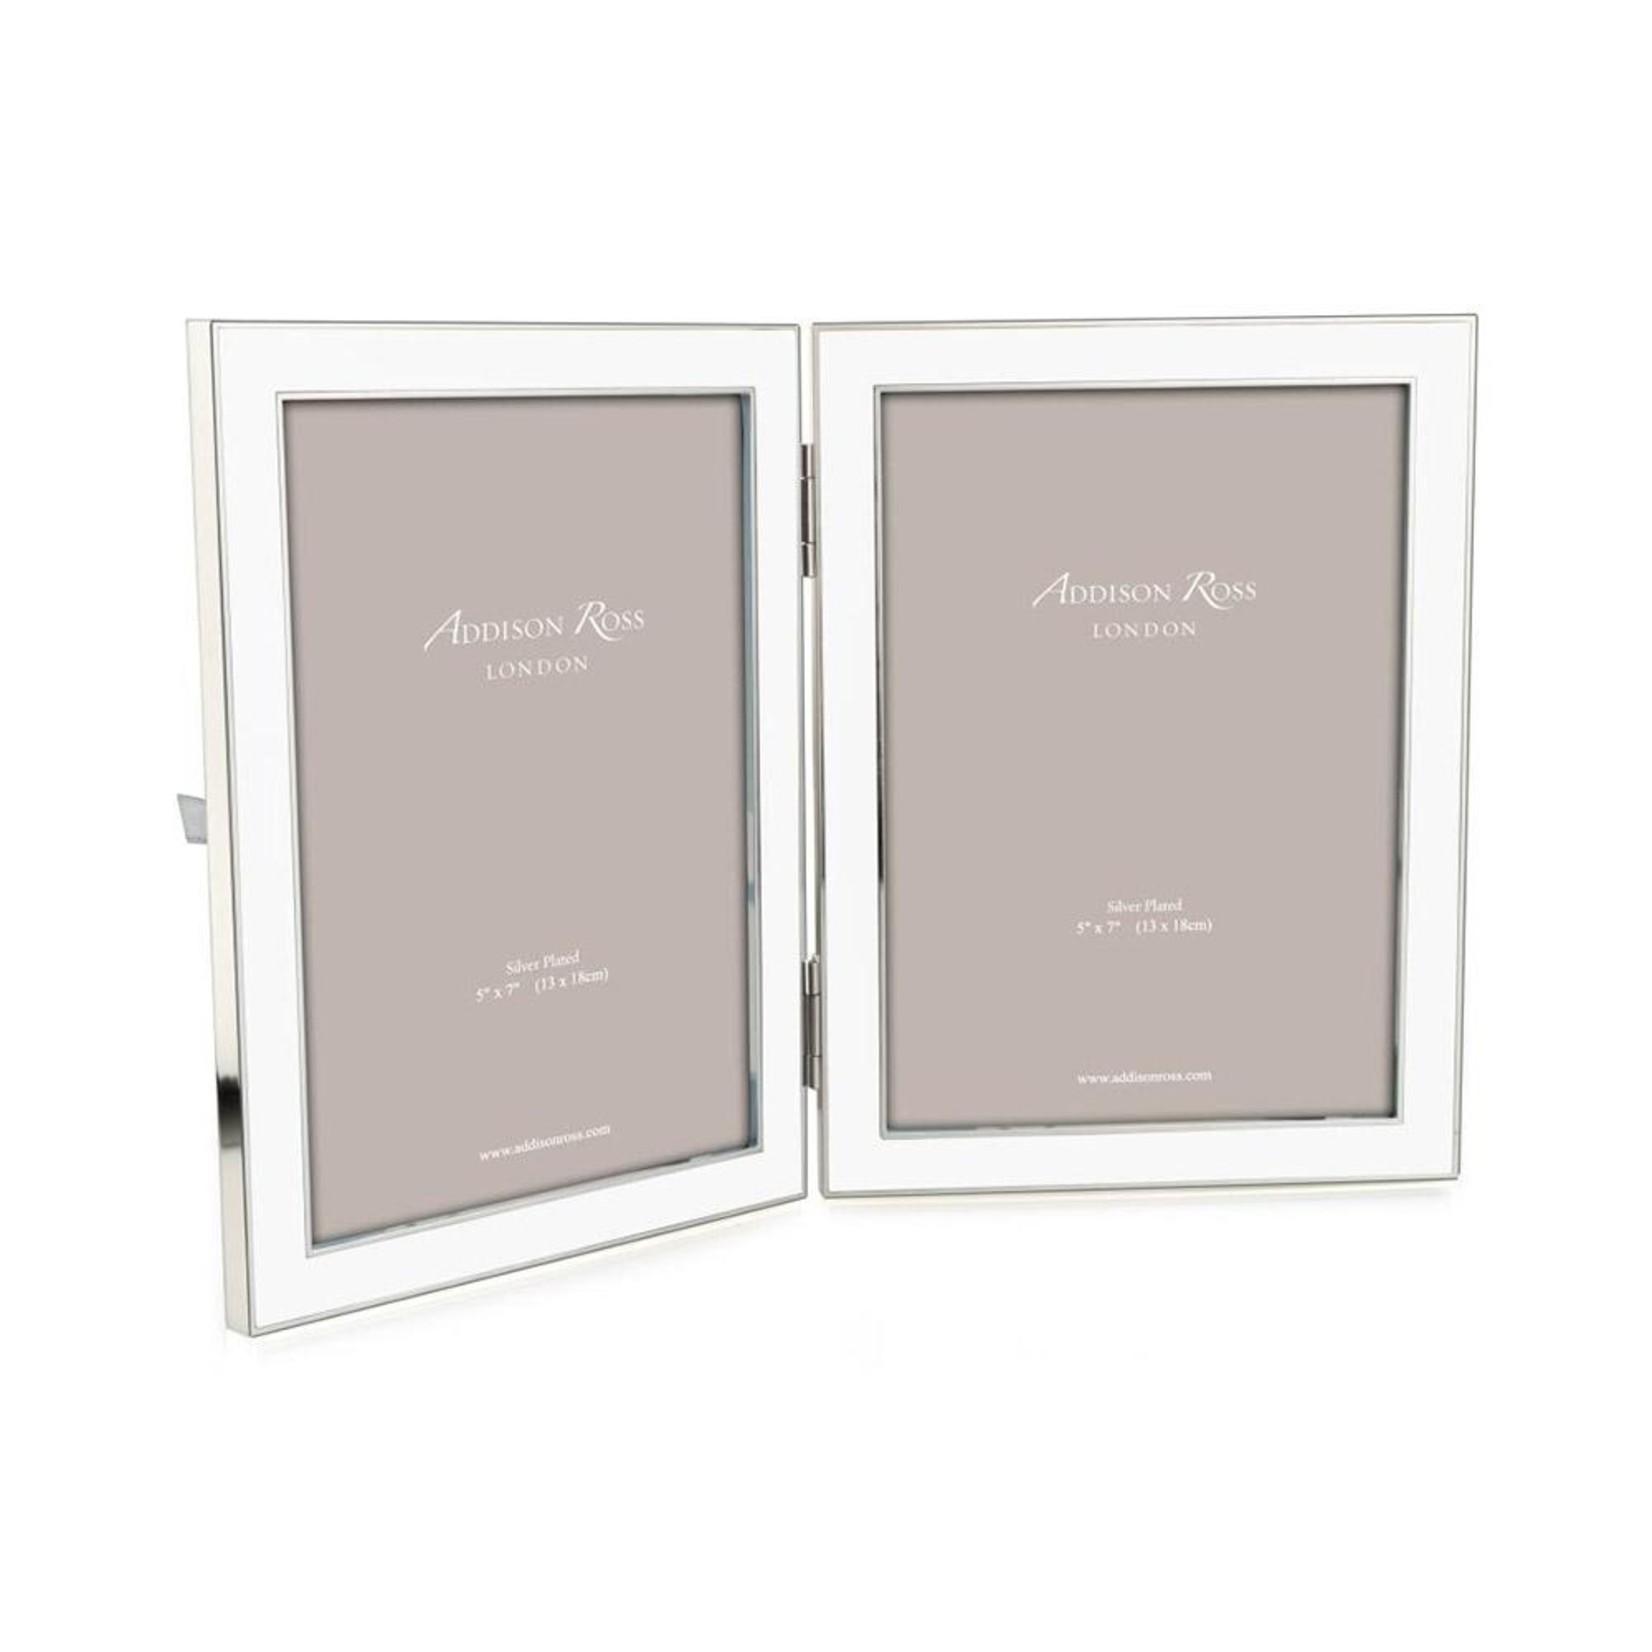 Addison Ross White Enamel & Silver Double Frame - 5x7